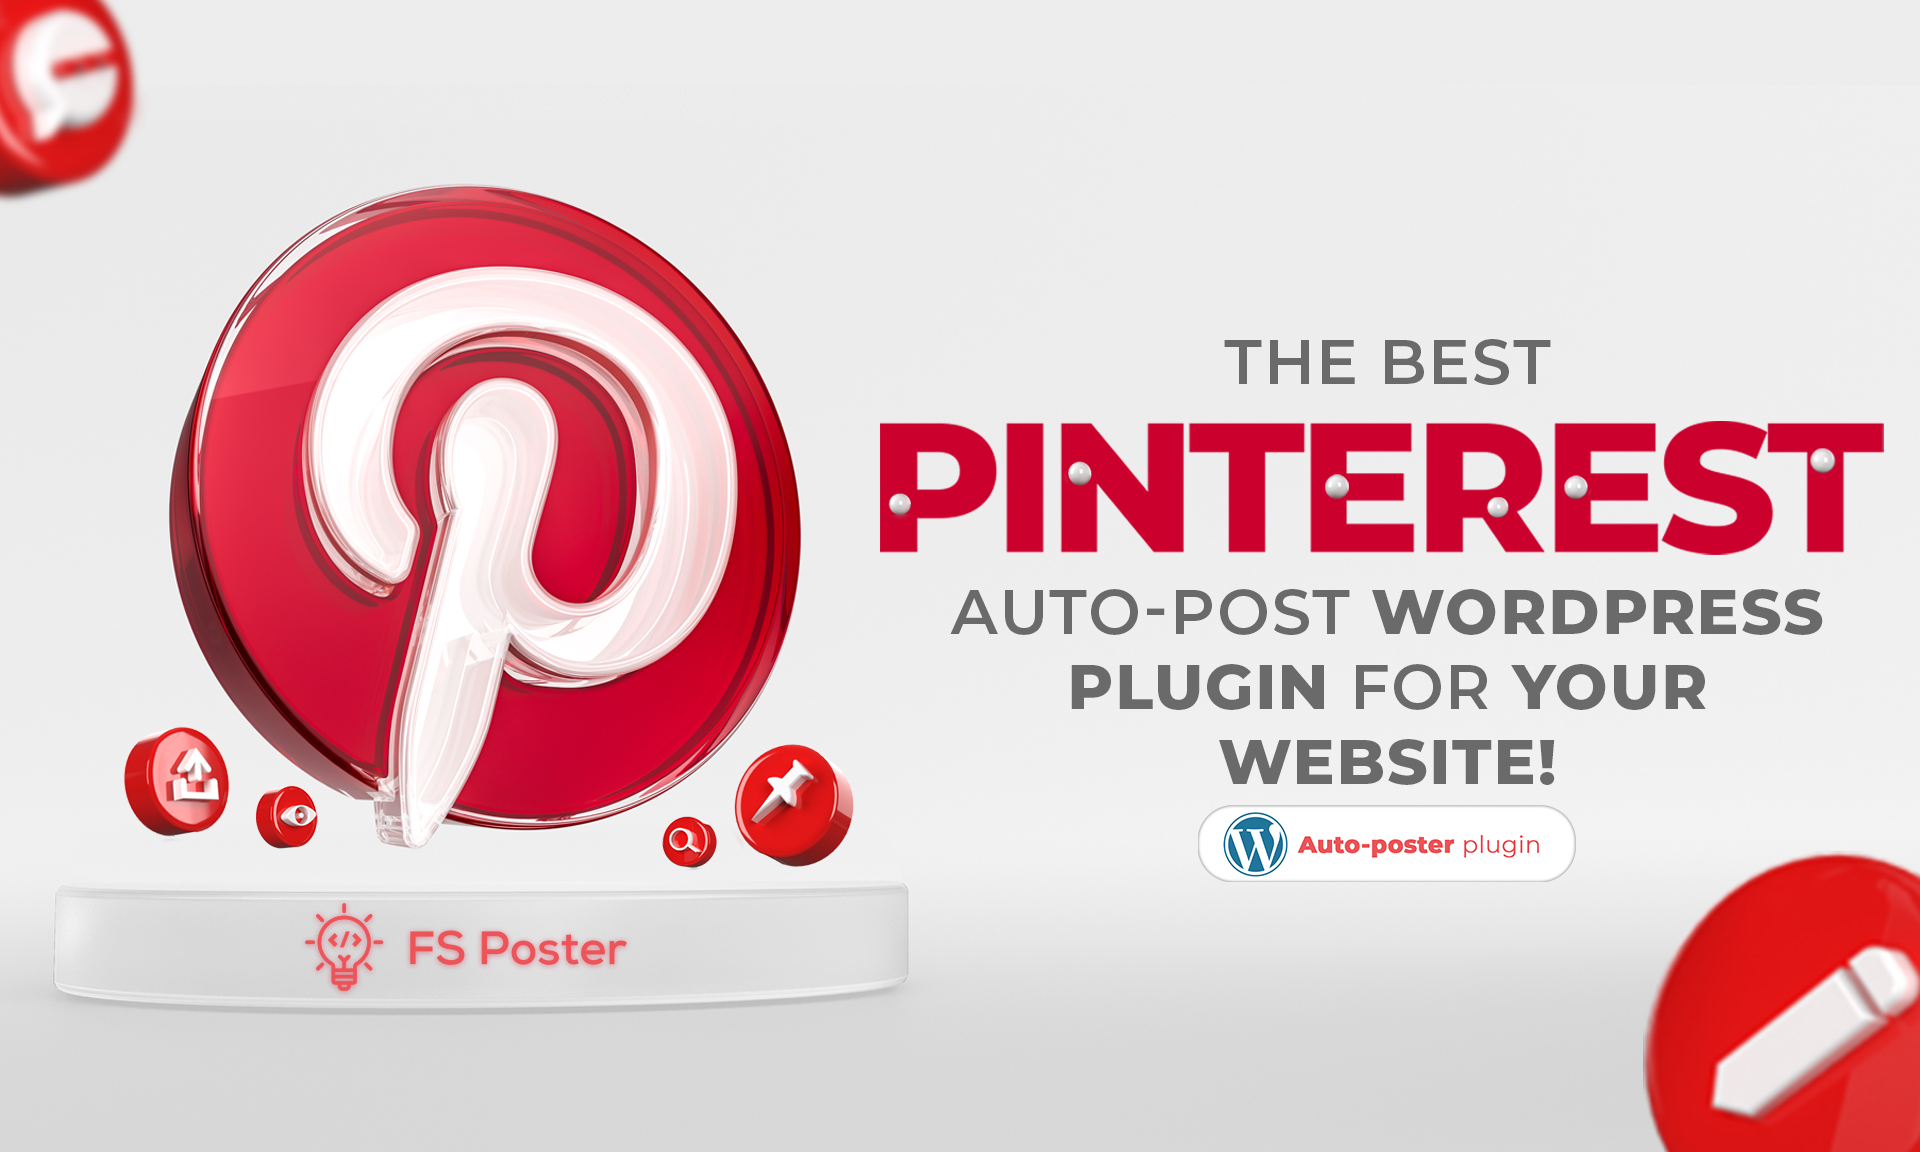 The best Pinterest auto-post WordPress plugin for your website